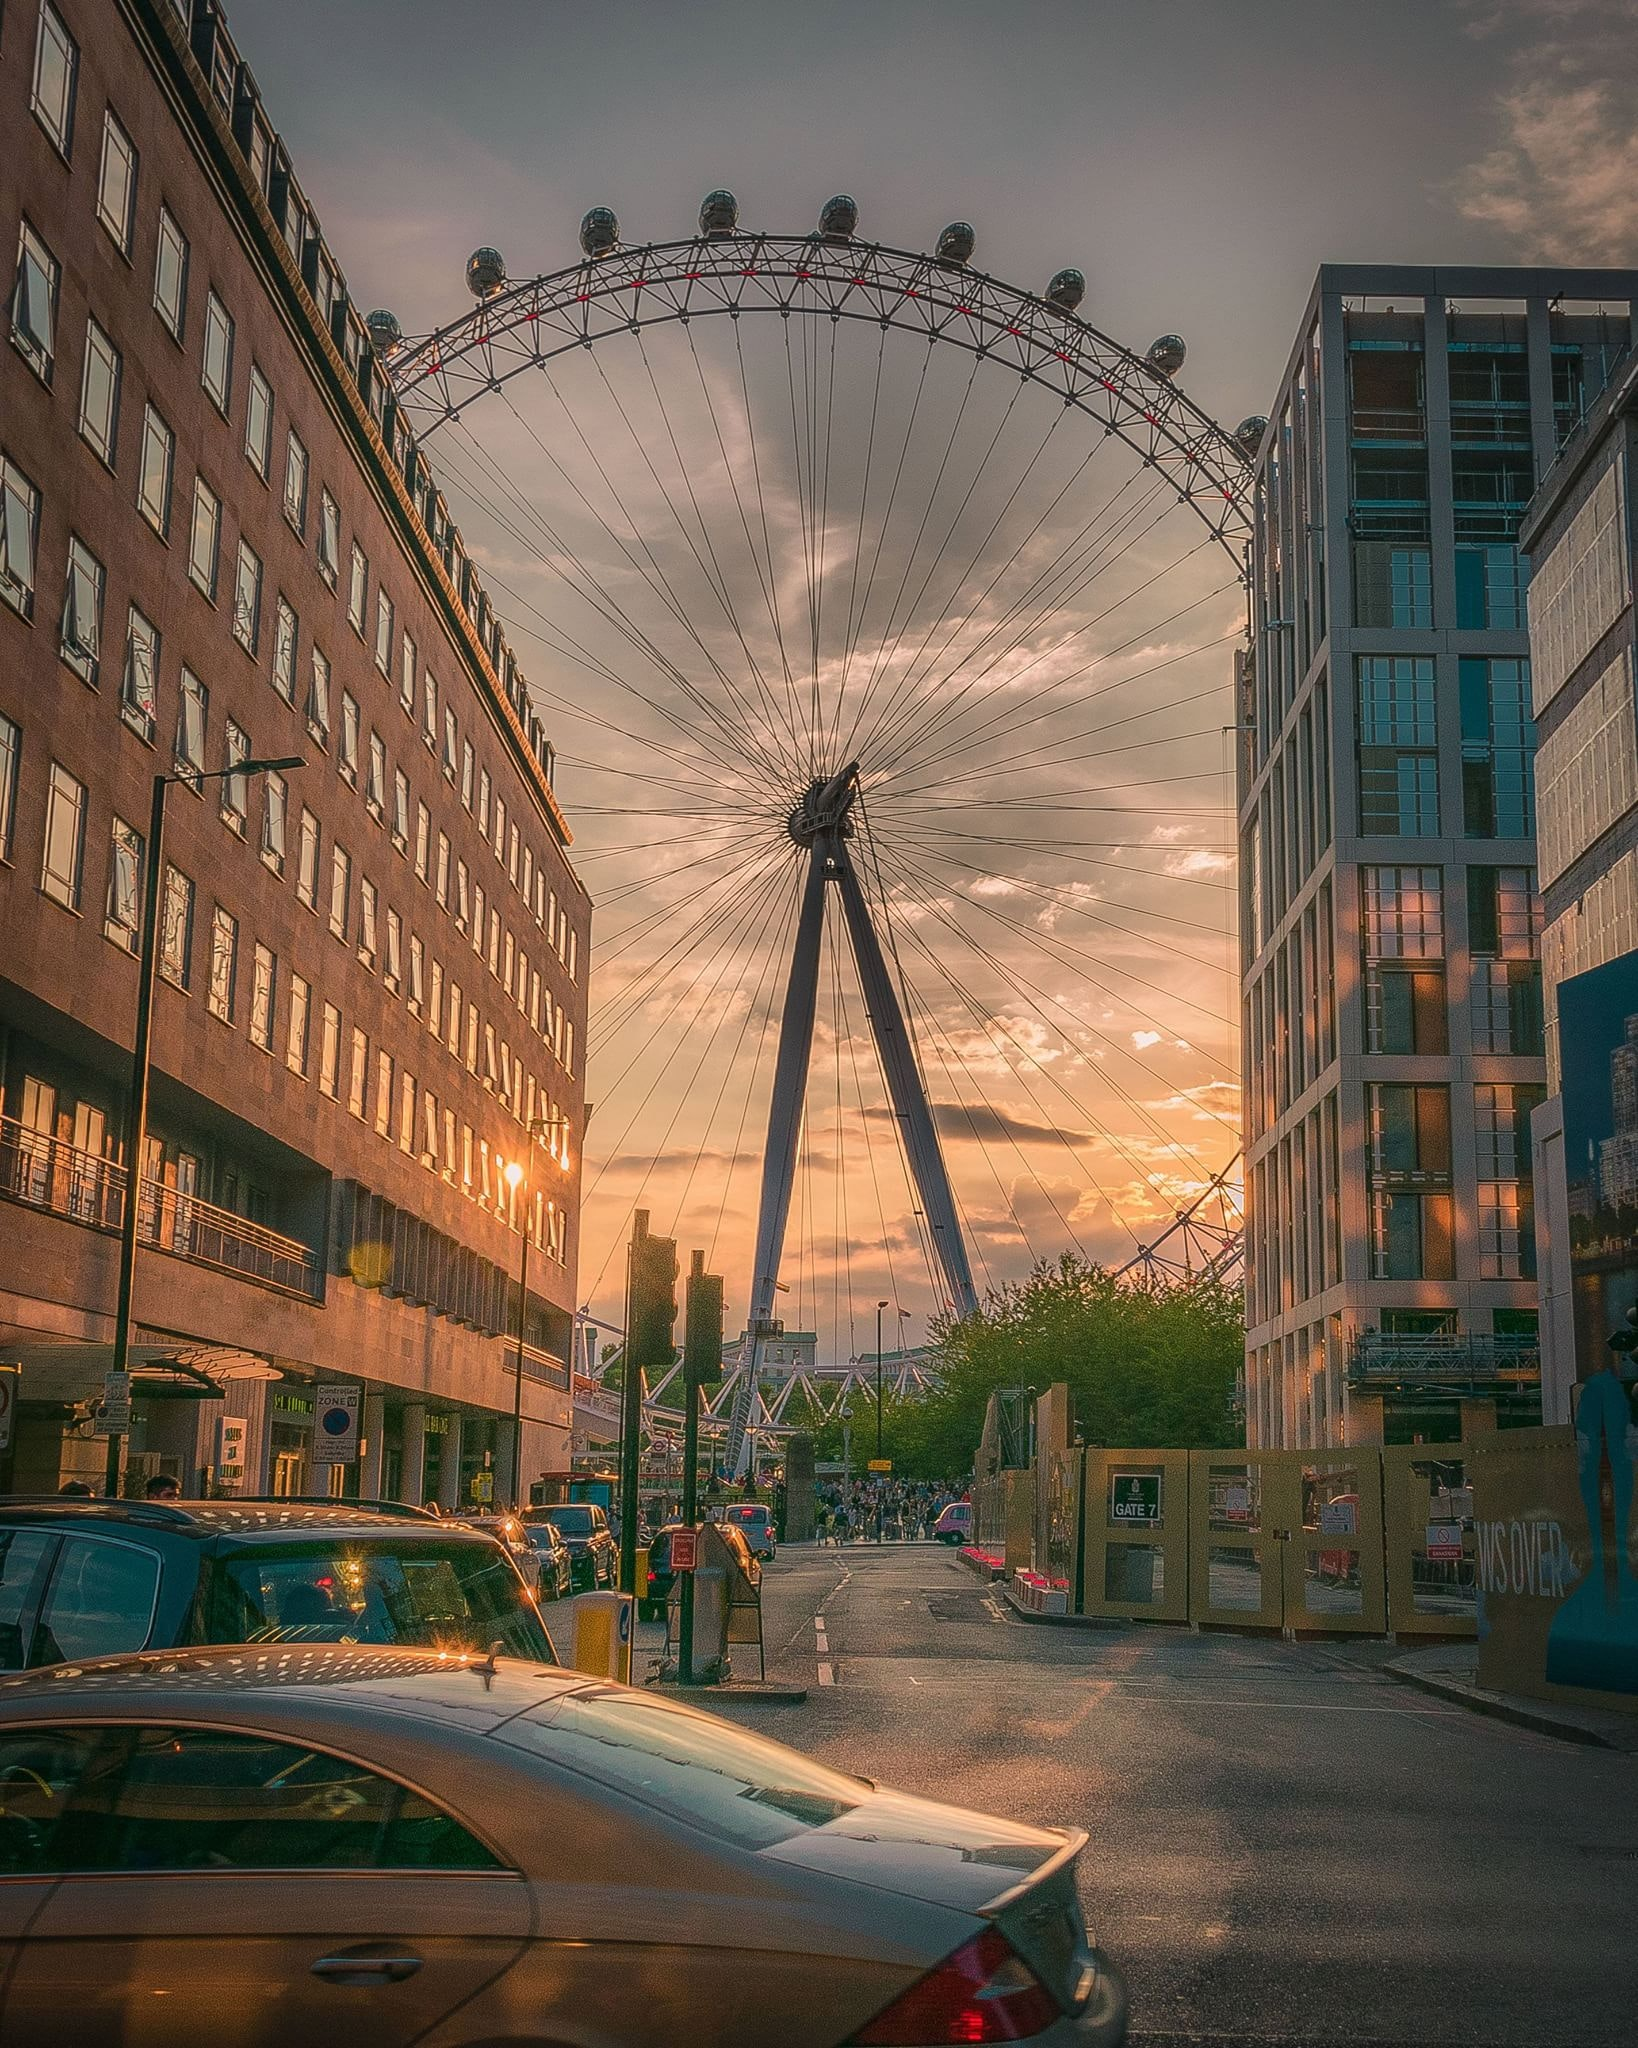 Ferris Wheel Near Building during Sunset, Outdoors, Vehicles, Urban, Travel, HQ Photo